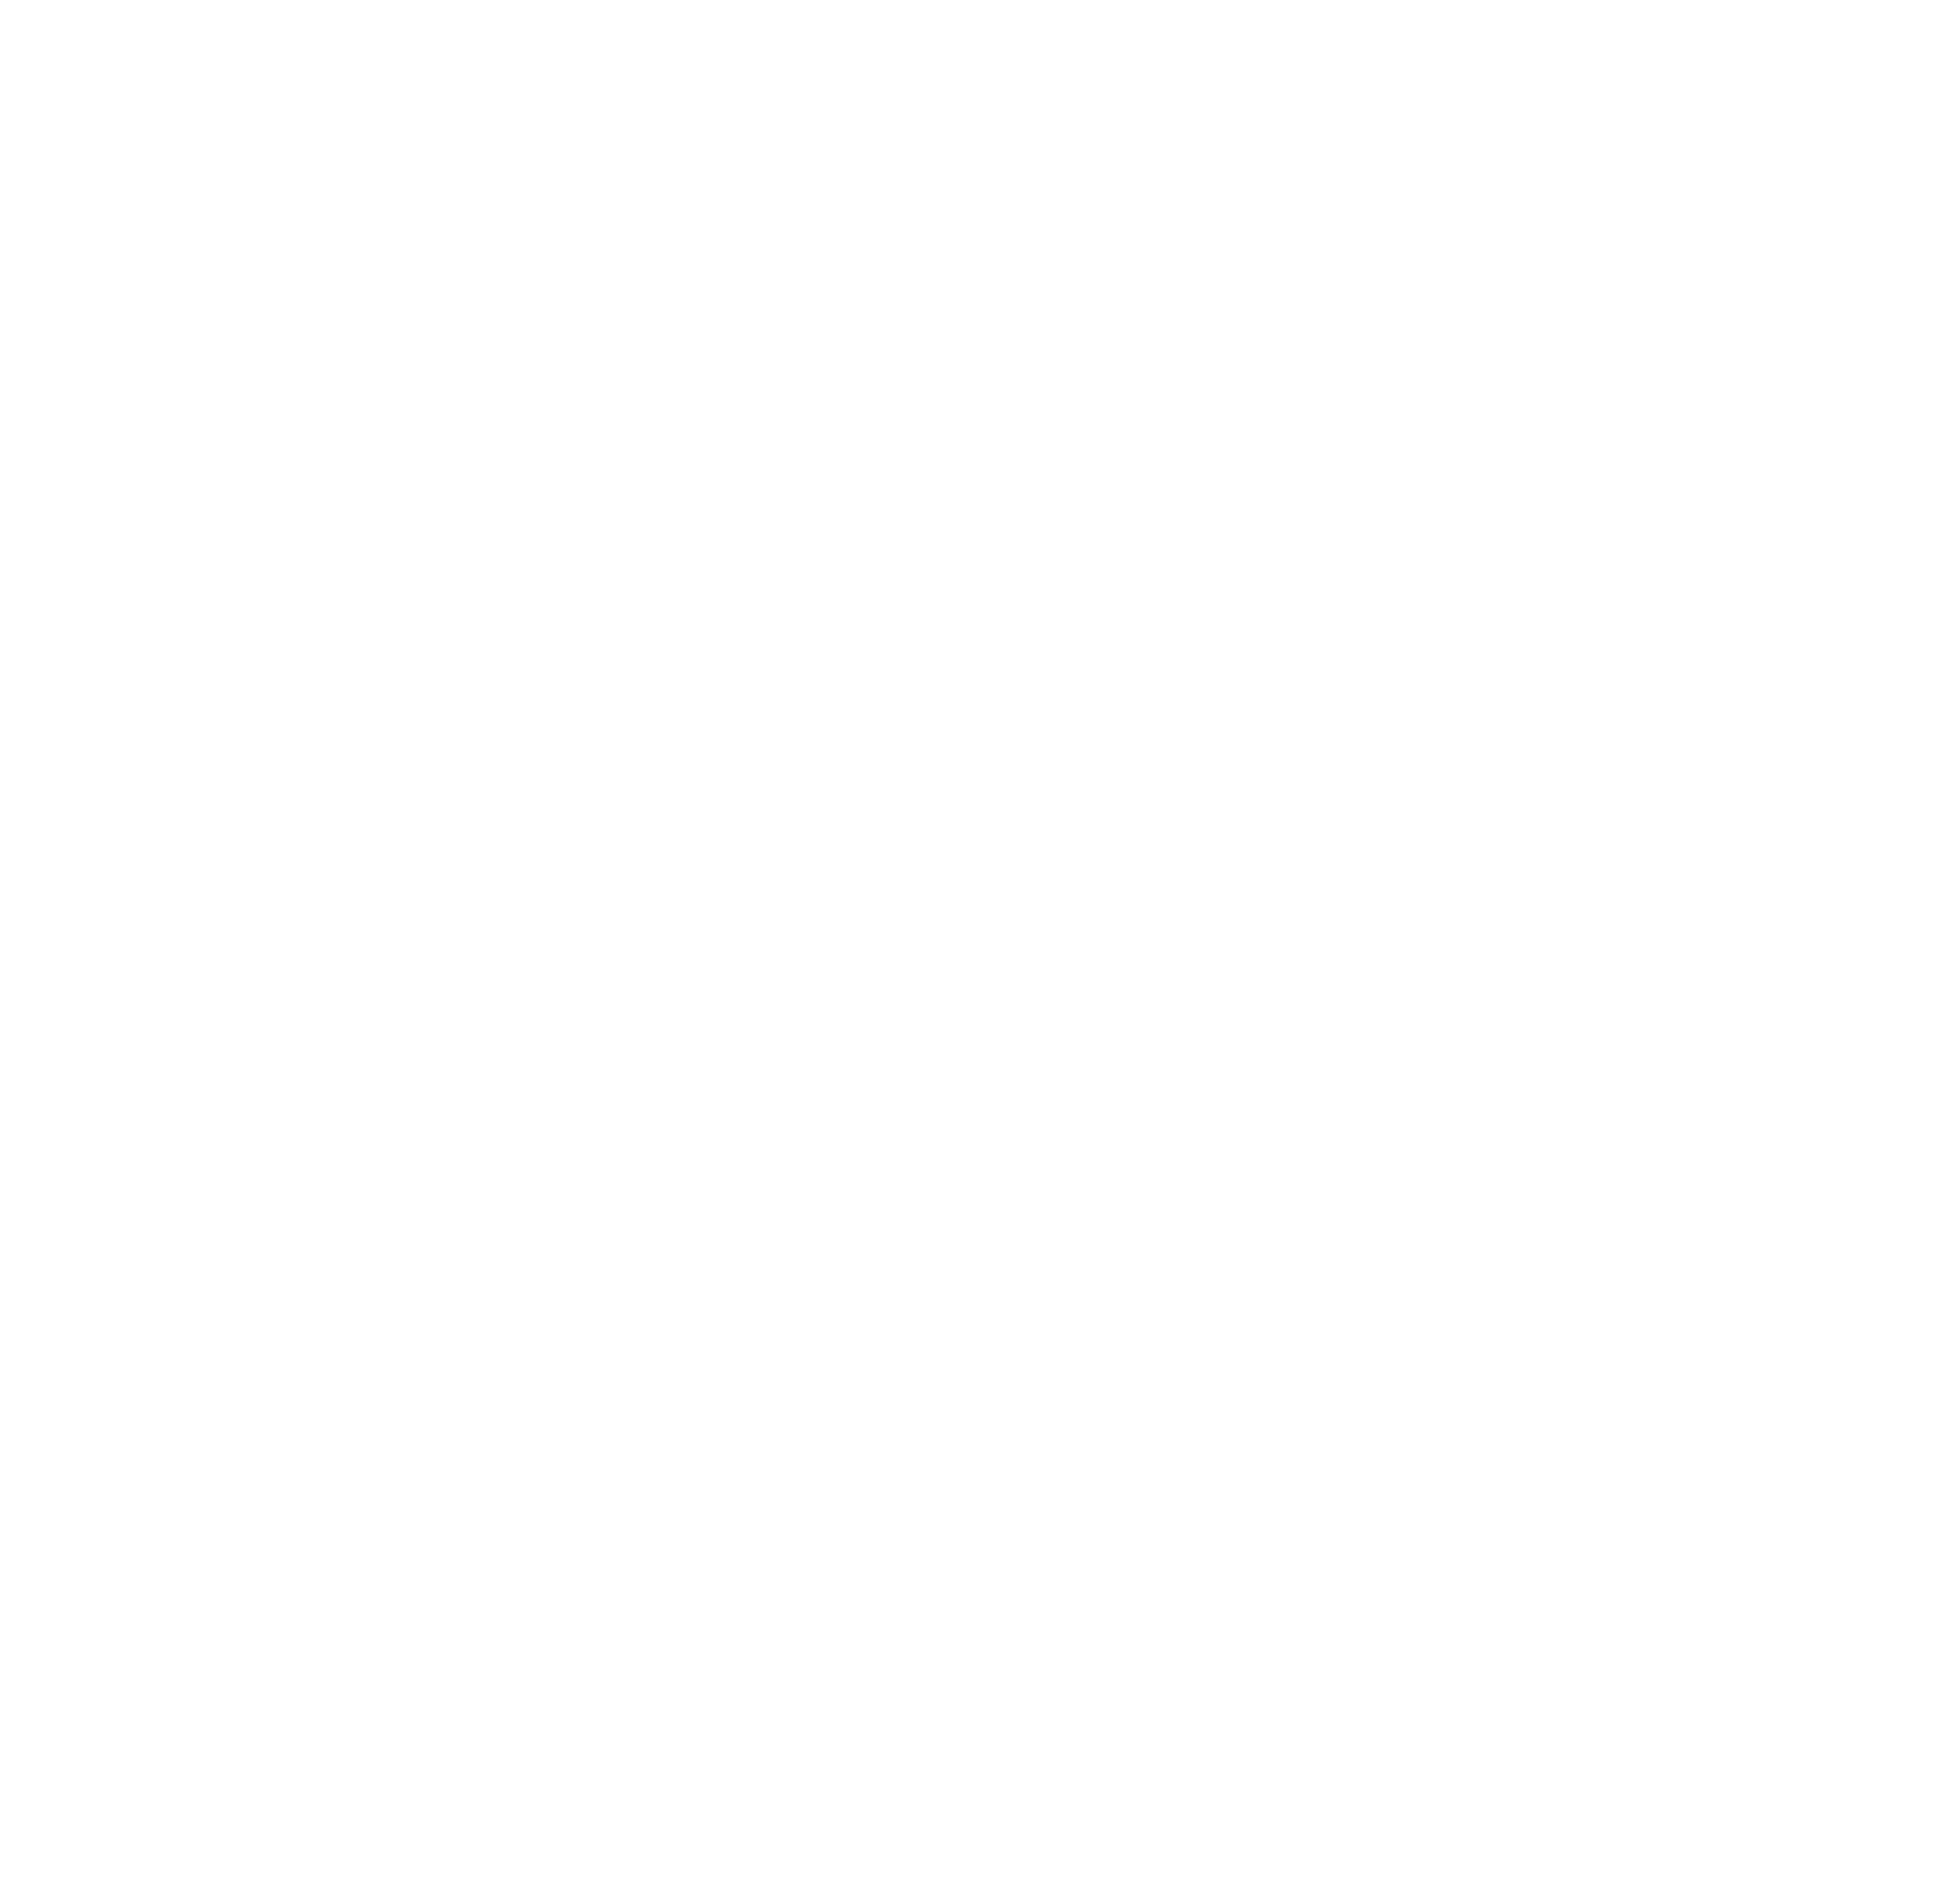 logo-zevk-white